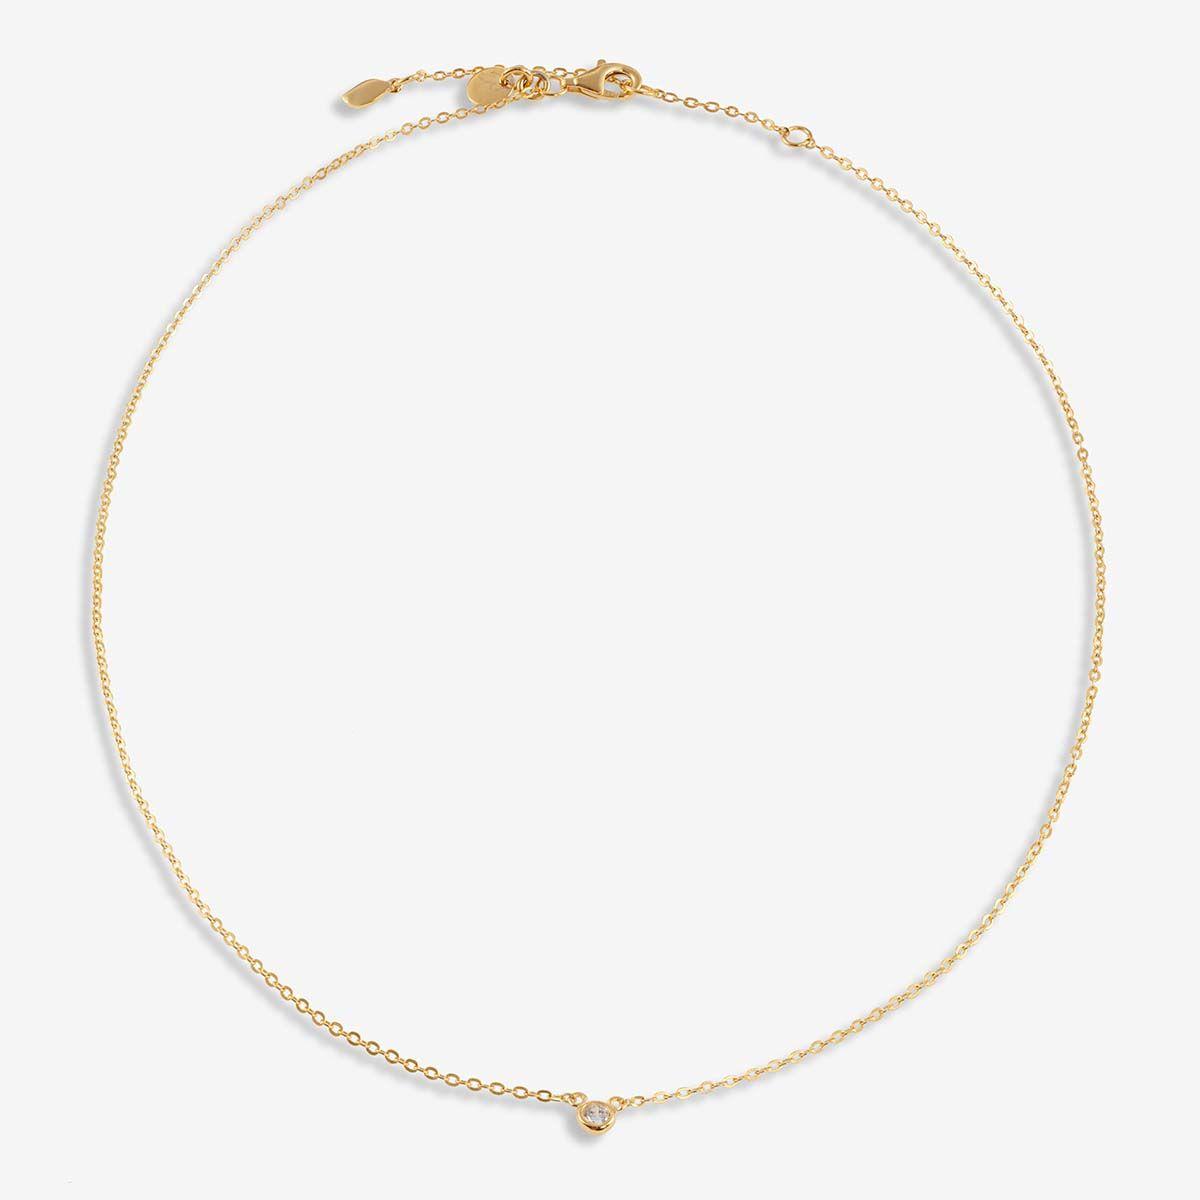 Wilma - Halsketten - 18k vergoldet